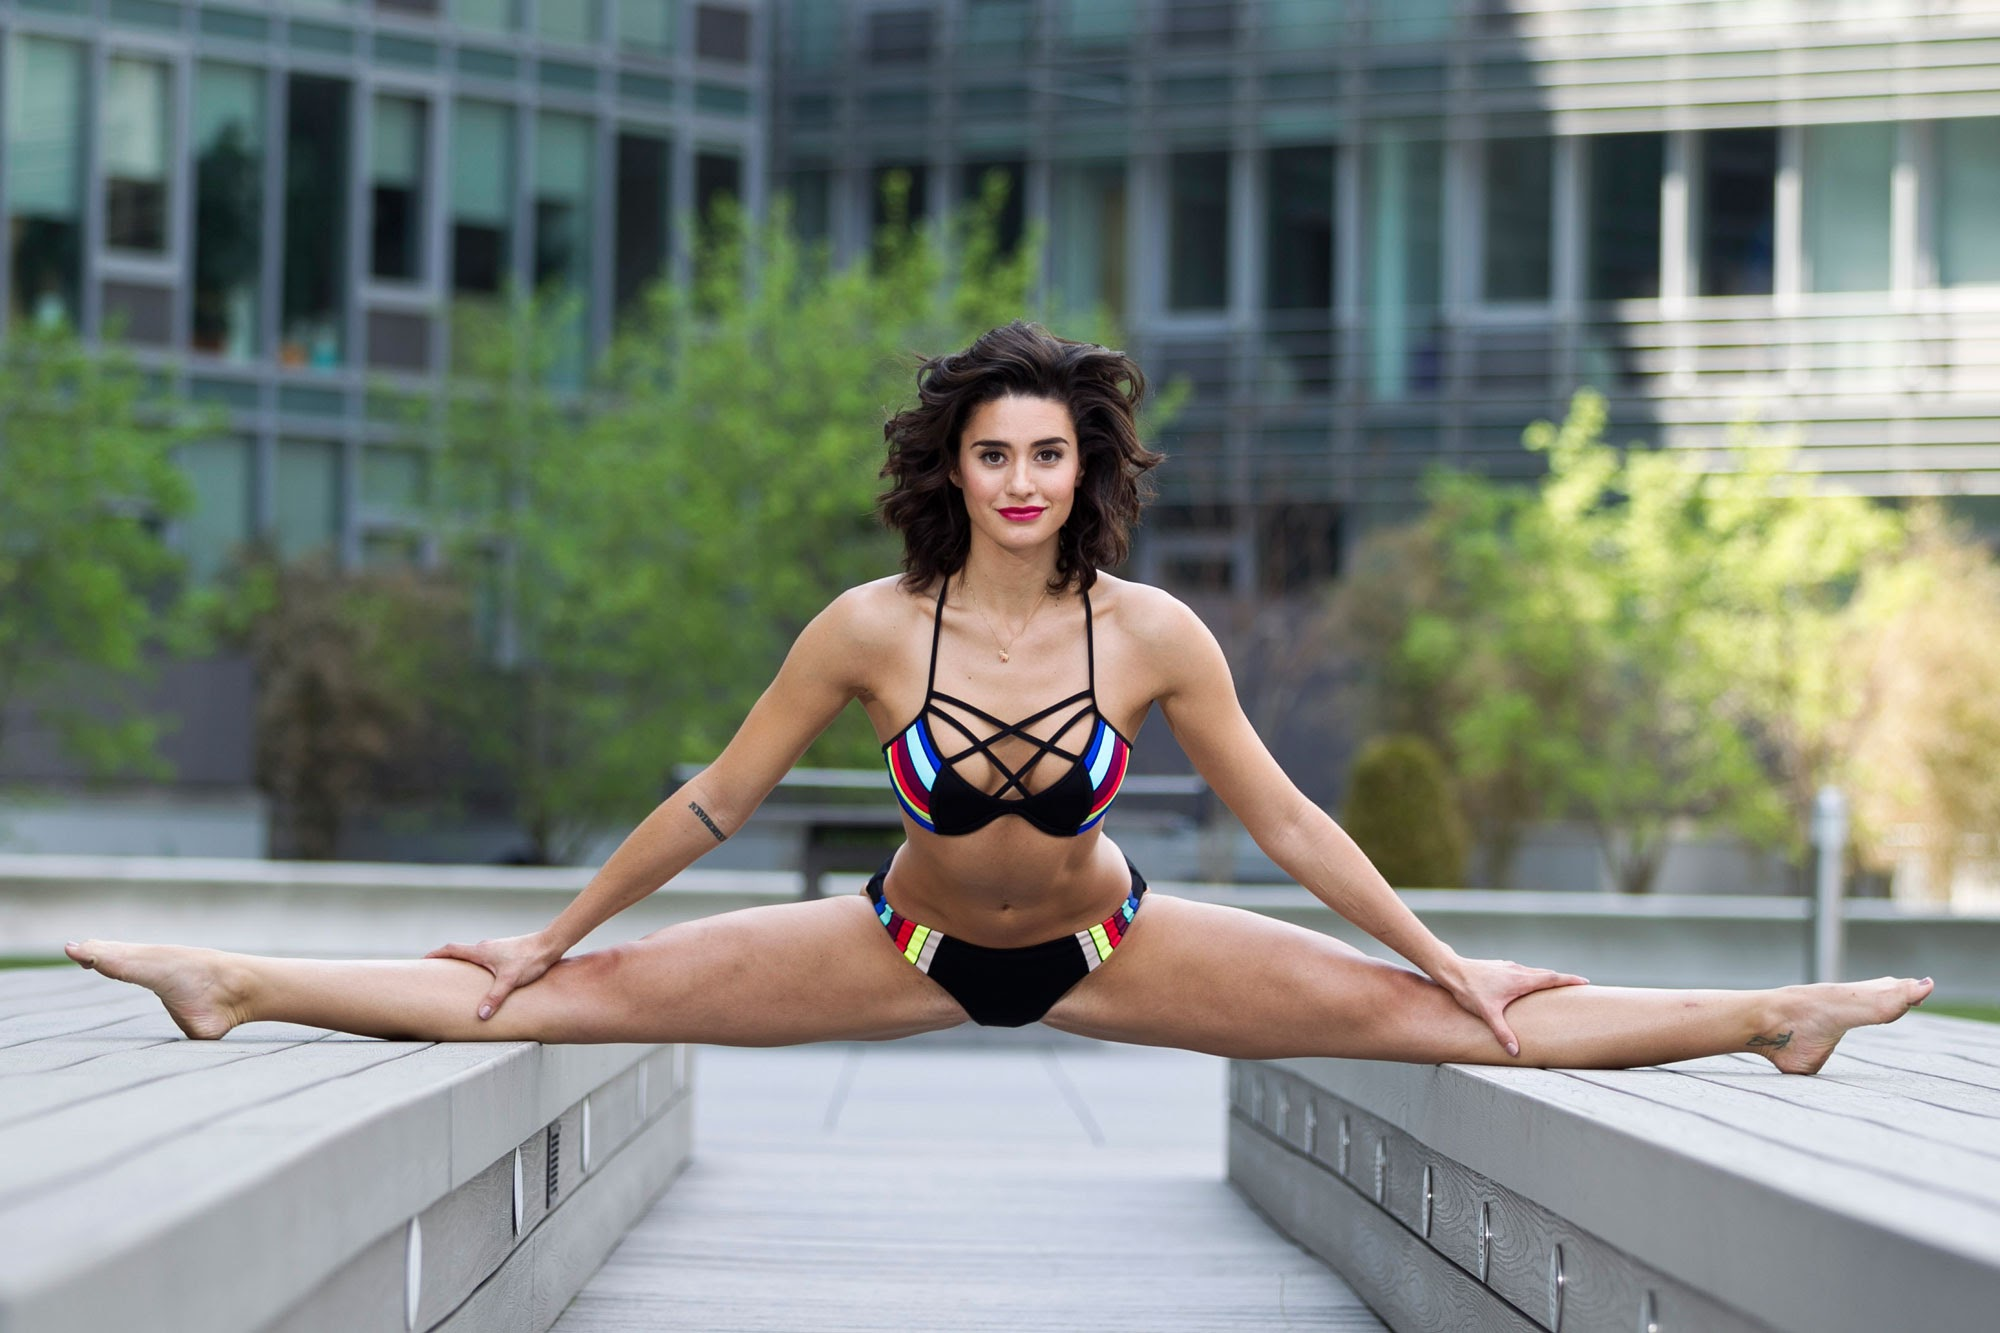 Selfie Bojana Krsmanovic nudes (83 photos), Sexy, Sideboobs, Twitter, lingerie 2017